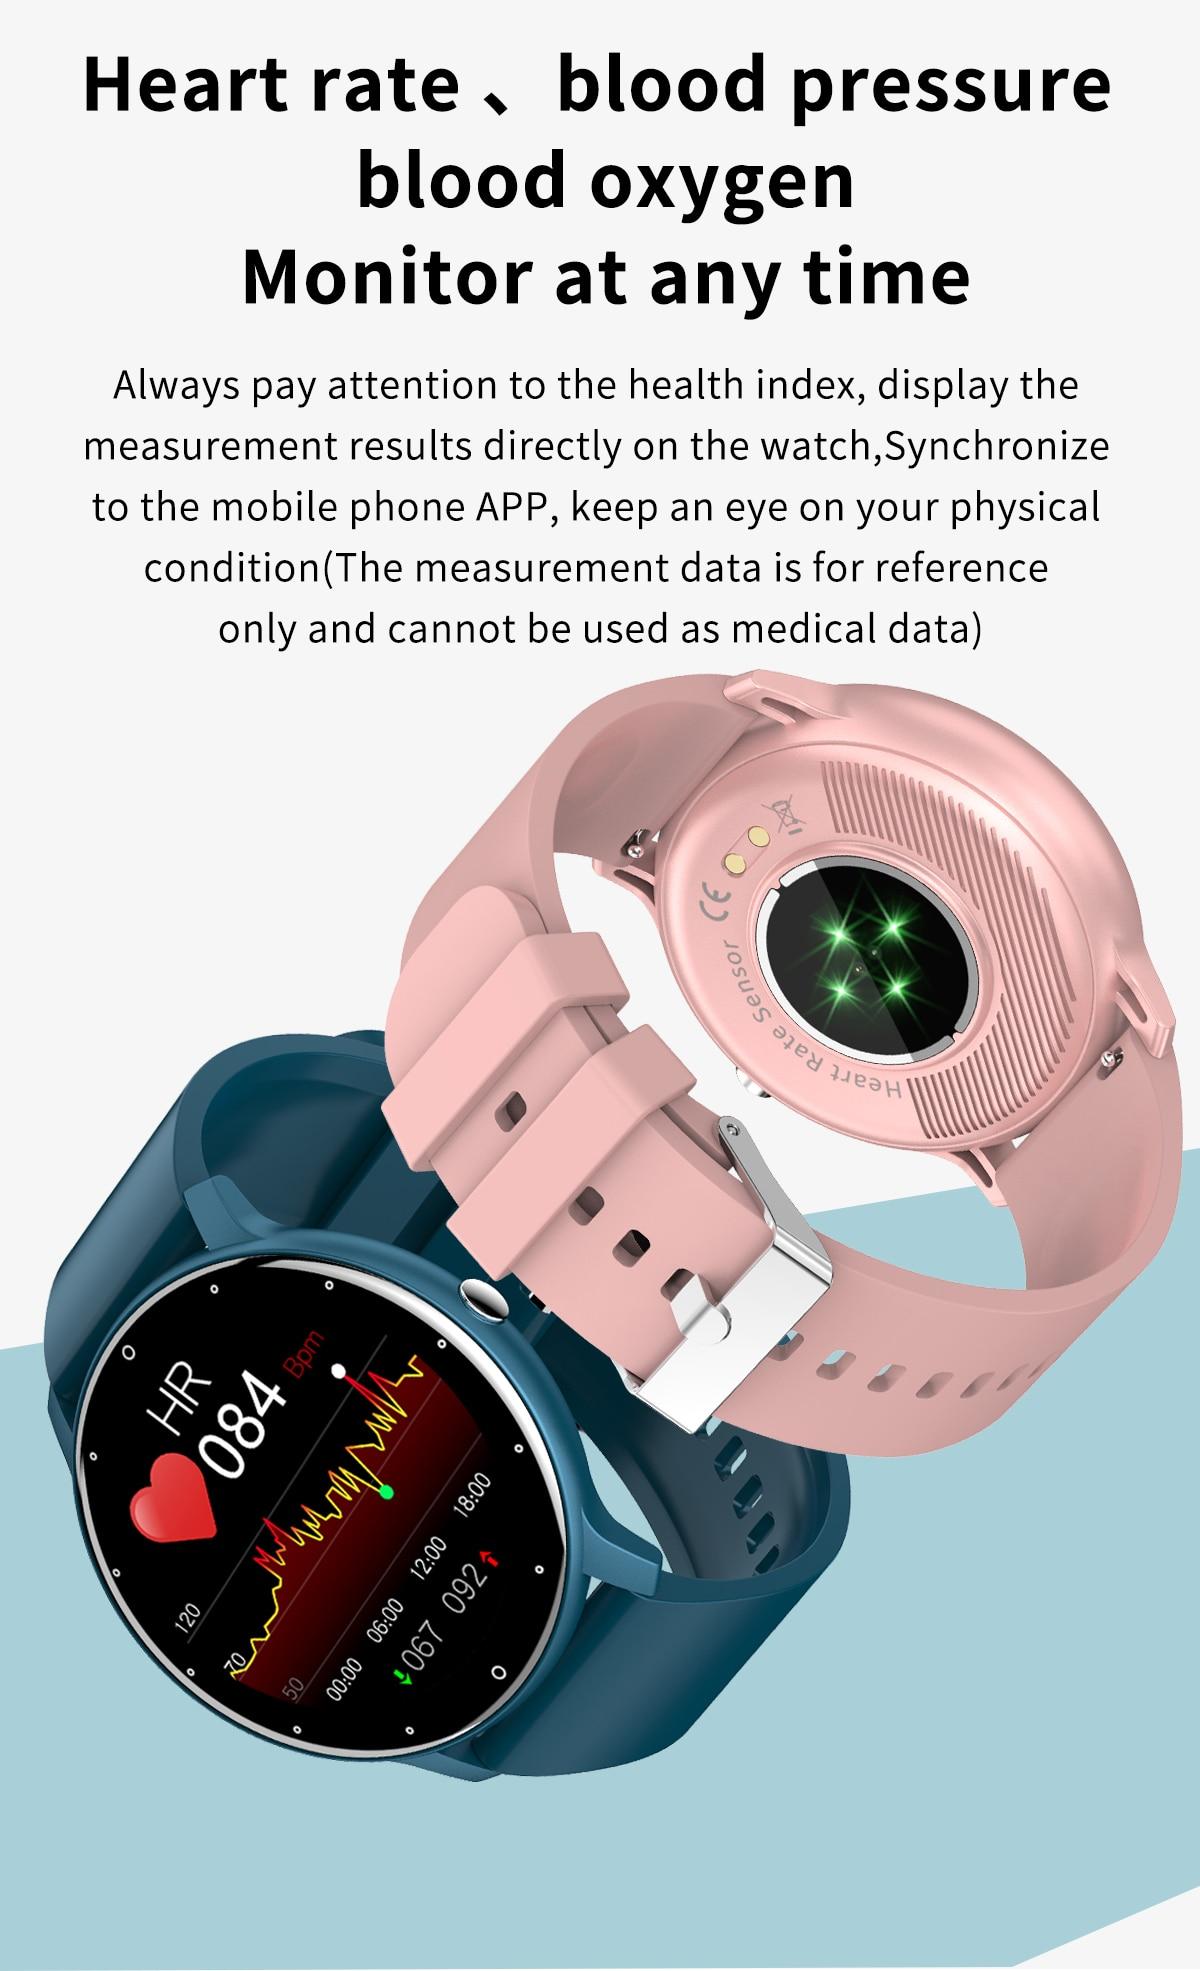 H3c98016e21b44c919aa6390496b9b21e0 LIGE 2021 Fashion Smart Watch Men Fitness Bracelet Heart Rate Blood Pressure Monitoring Sports Tracker Smartwatch Gift for Women